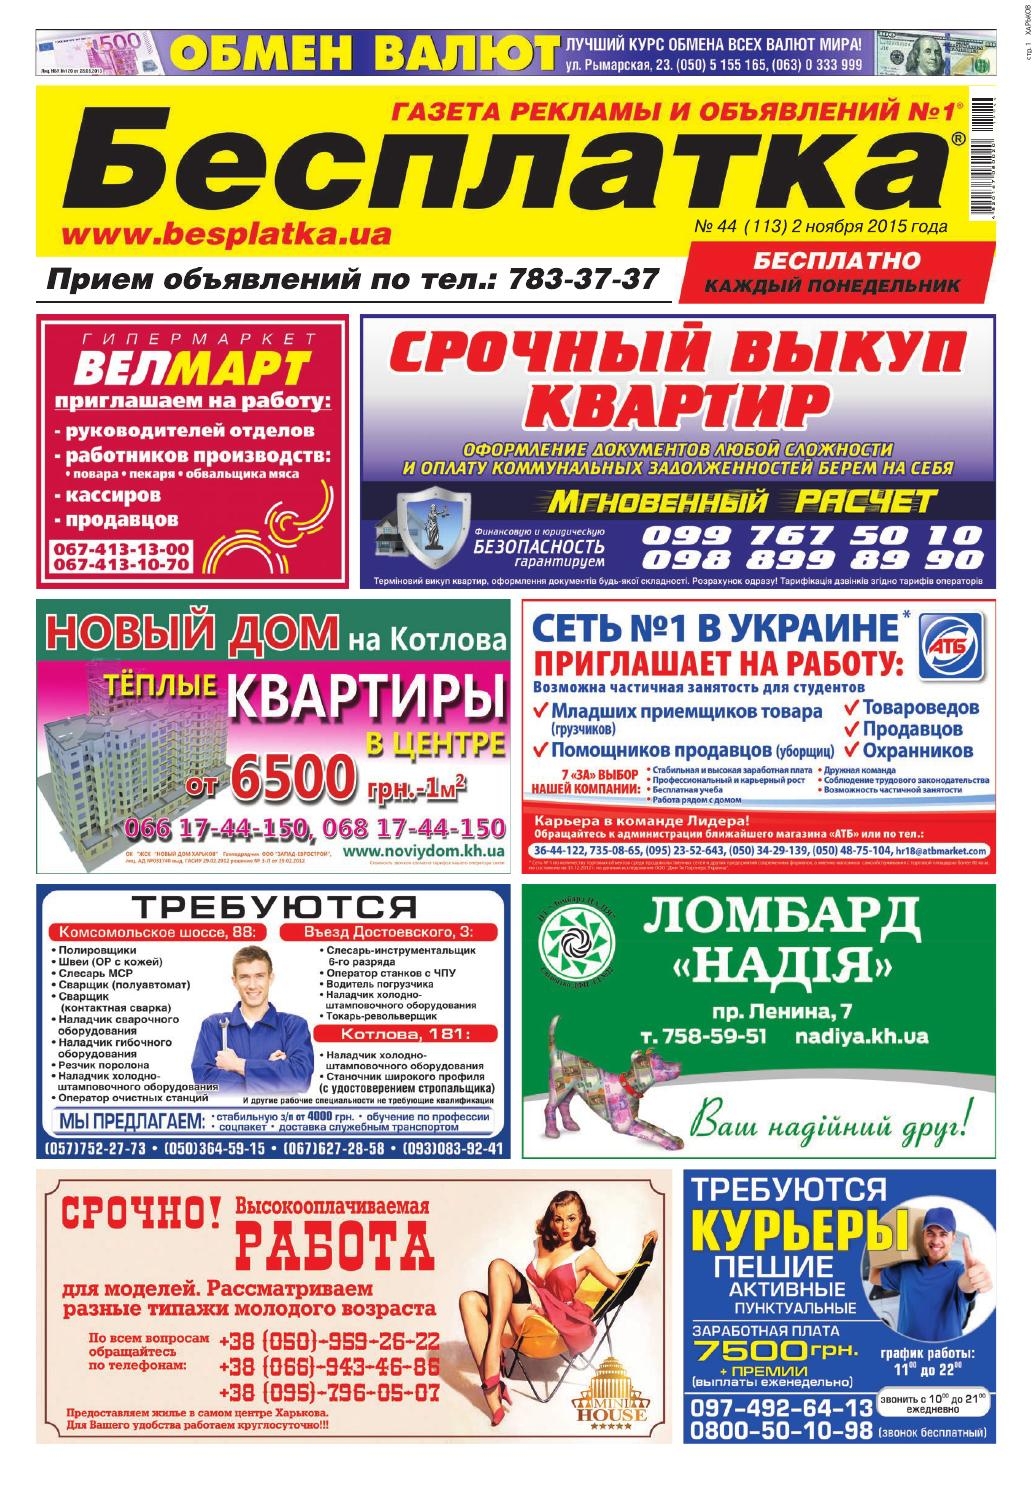 Besplatka  44 Харьков by besplatka ukraine - issuu aded2066fd4